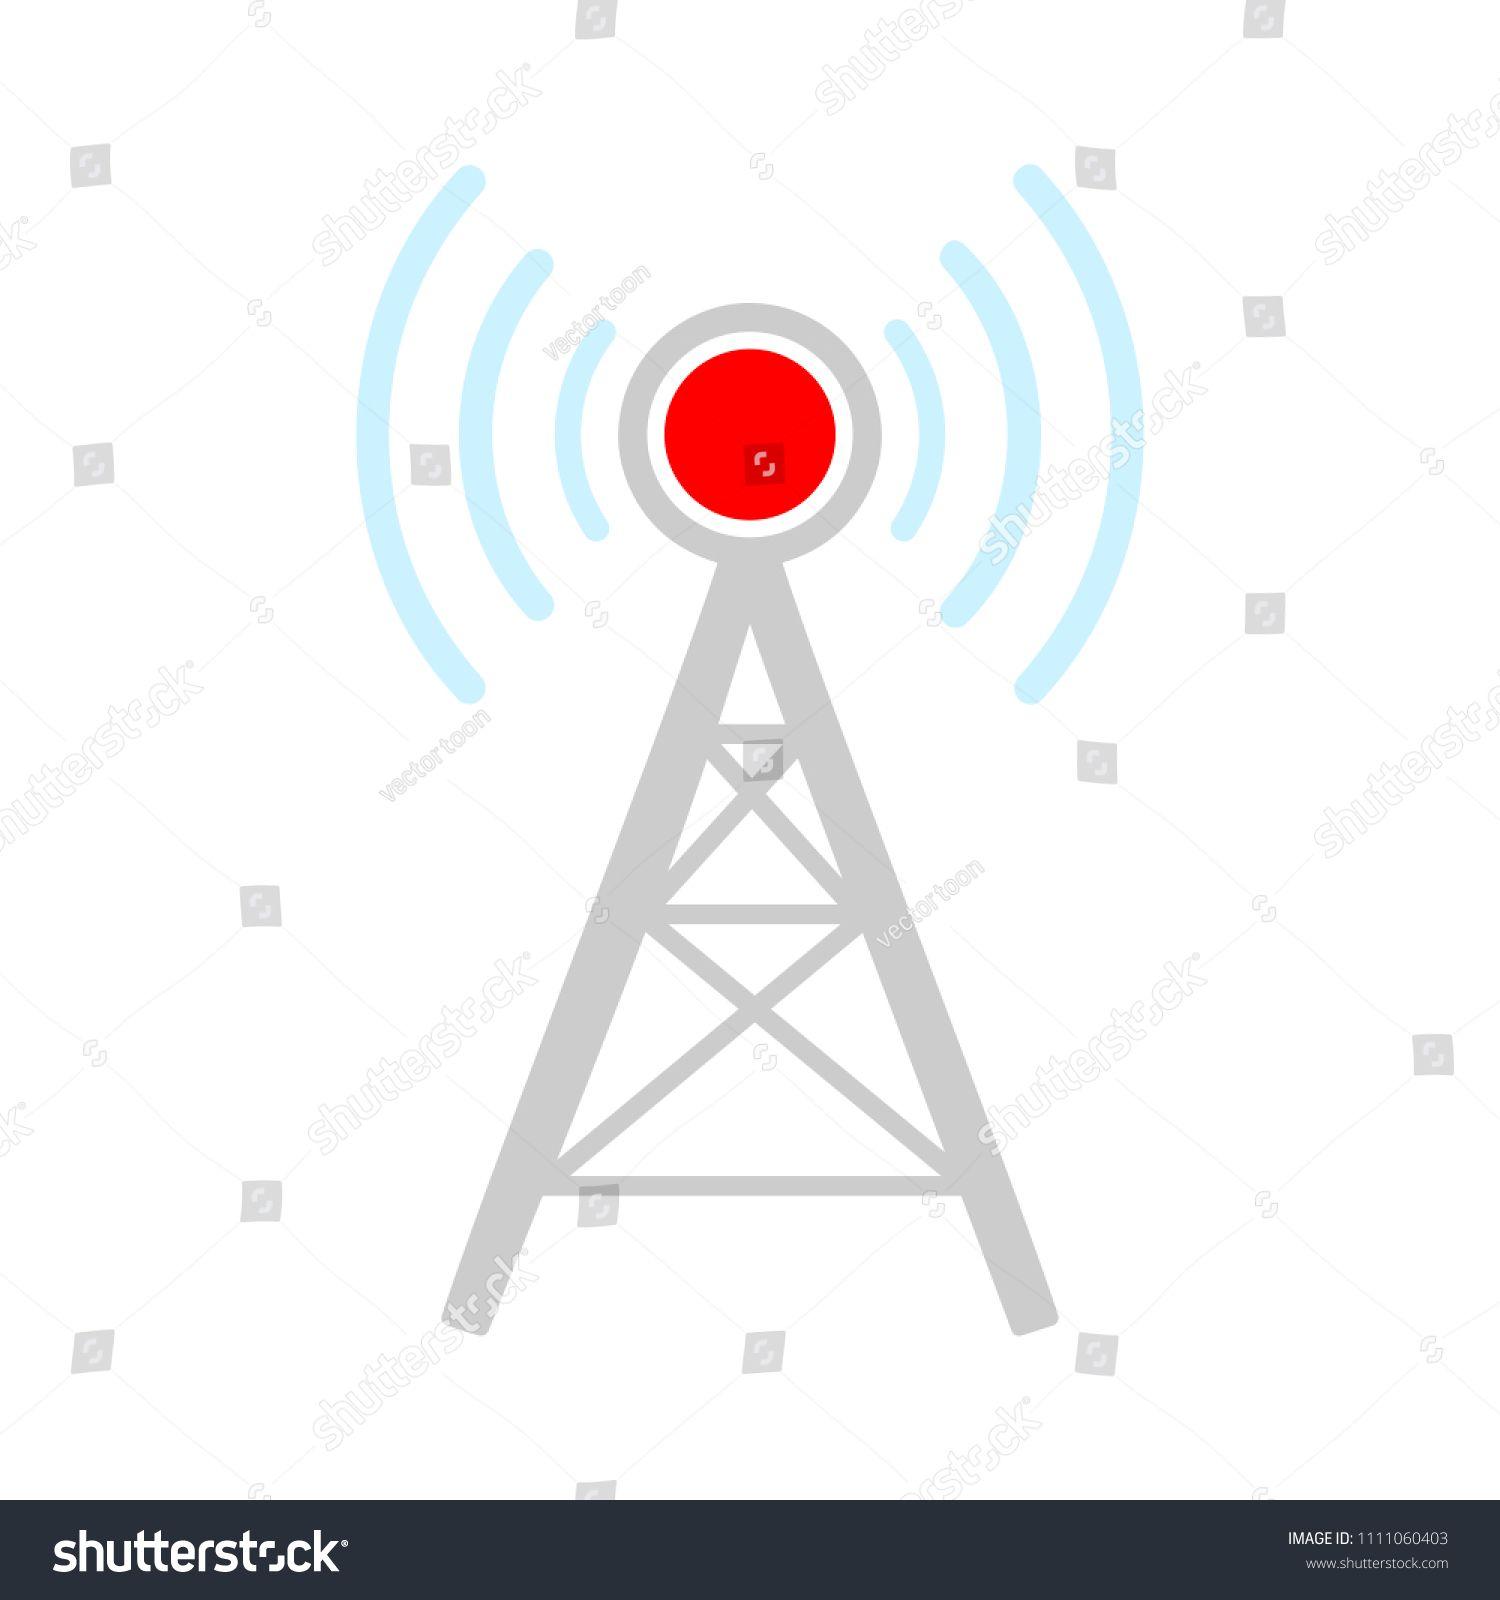 vector wireless network symbol, wifi icon communication